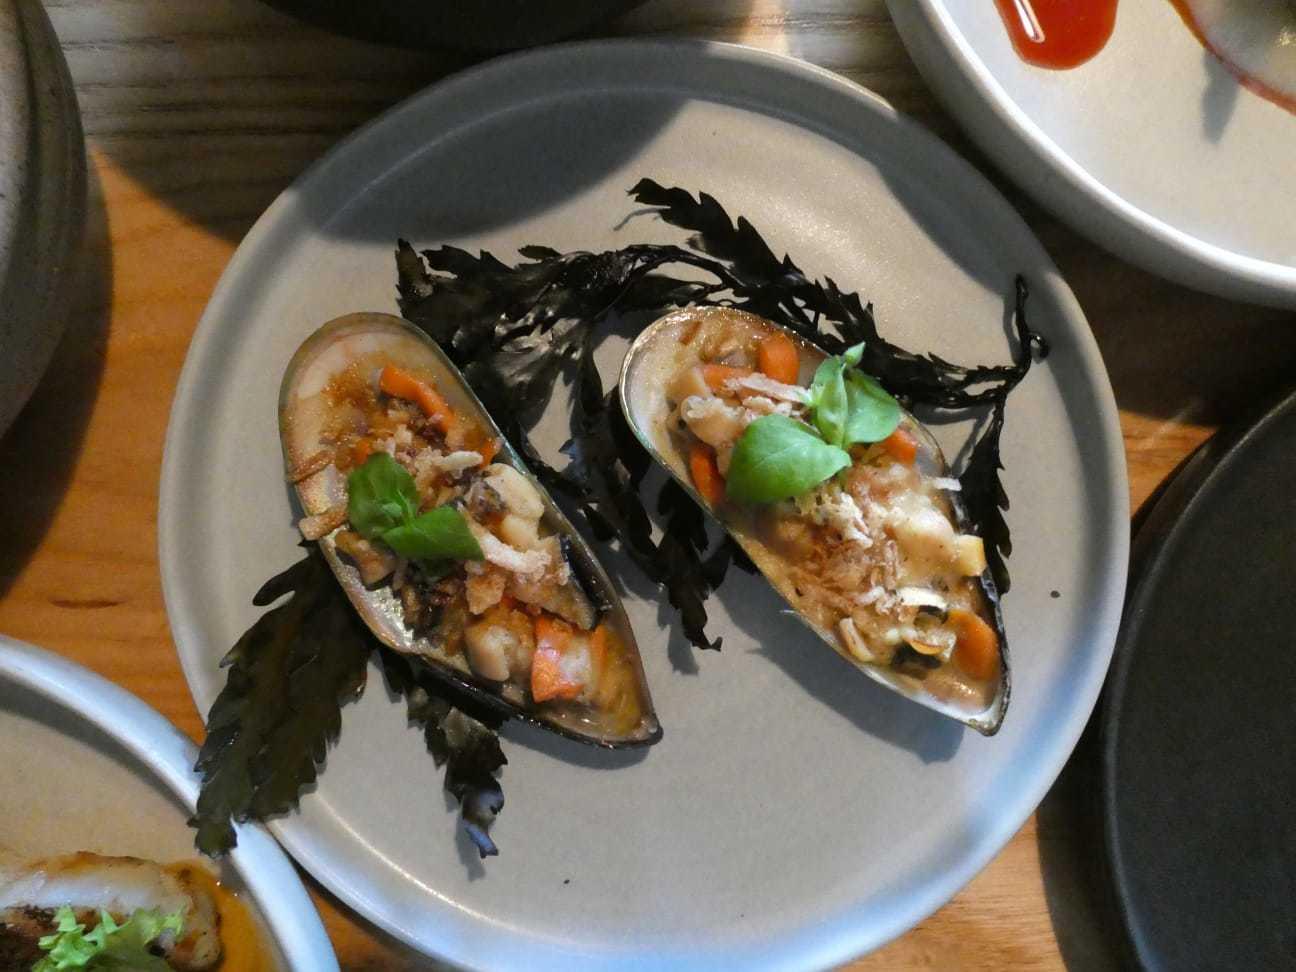 Recipe: Mussels Thermidor